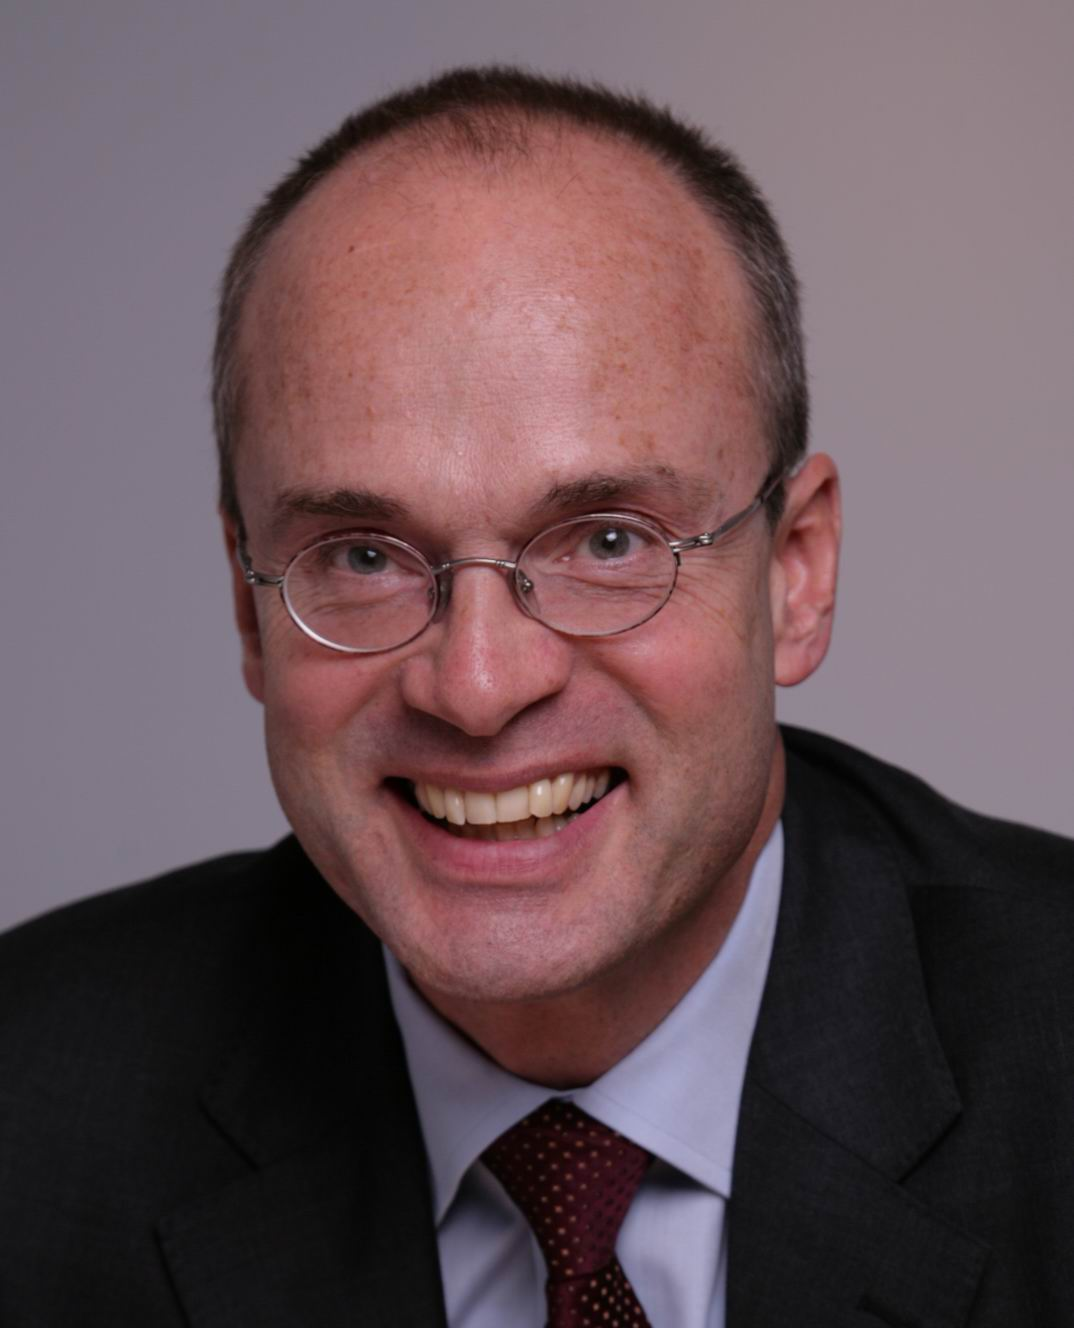 Profiakquise Dr. Langhans GmbH